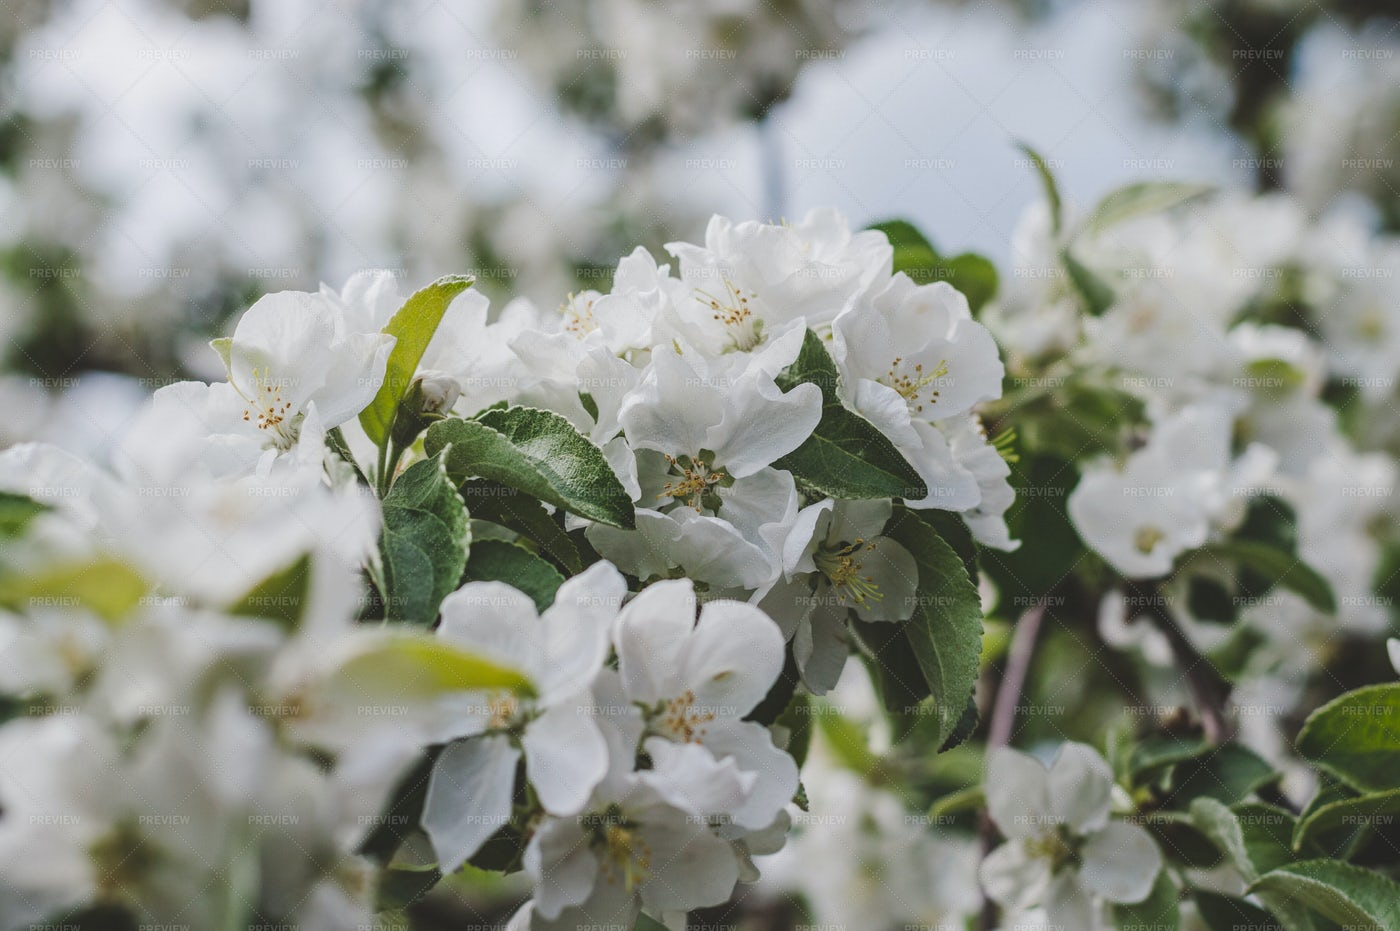 Flowering Apple Tree Close-Up: Stock Photos